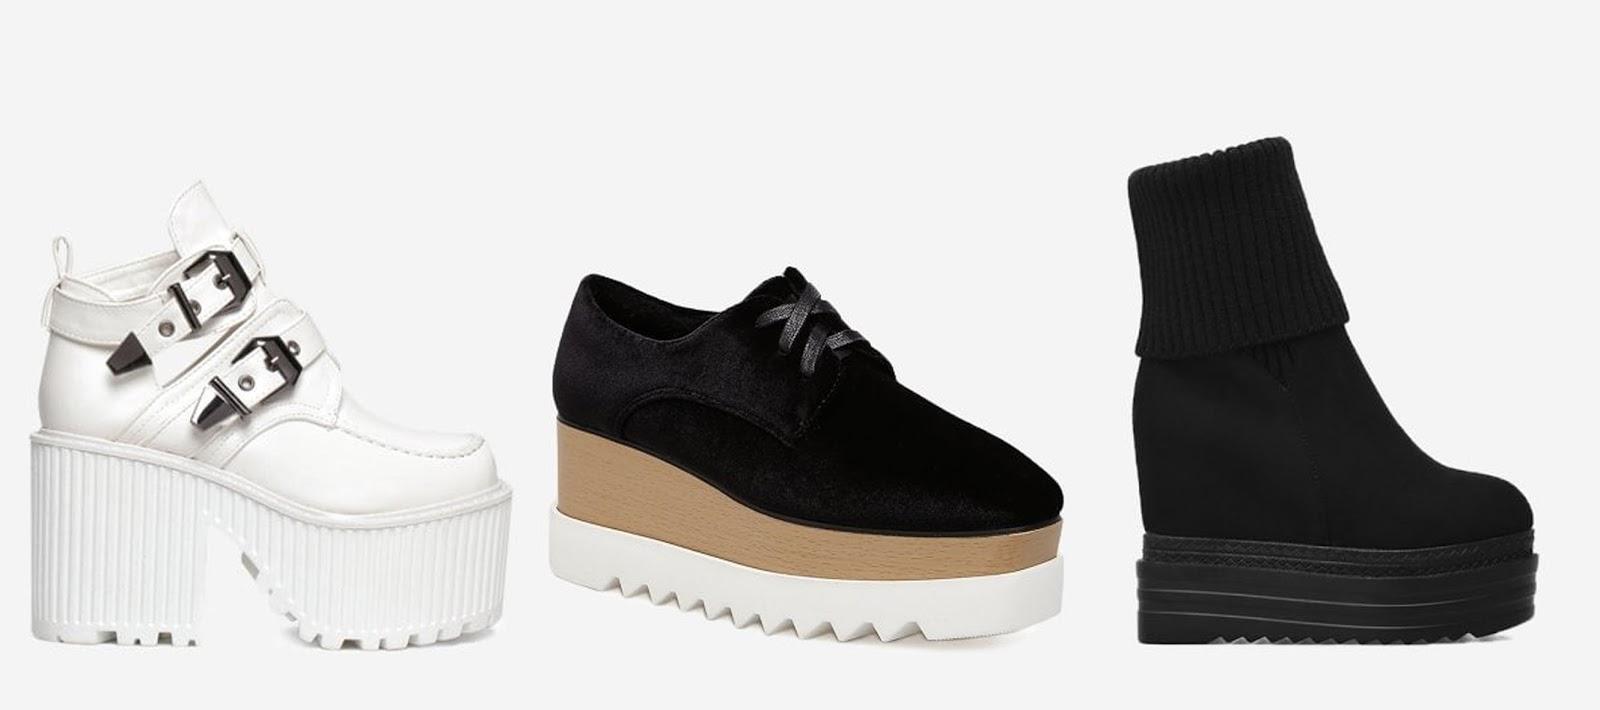 7e32b1faa Coruja Doce Blog - Priscila Leandro: Moda na Zaful: Louca Por Sapatos